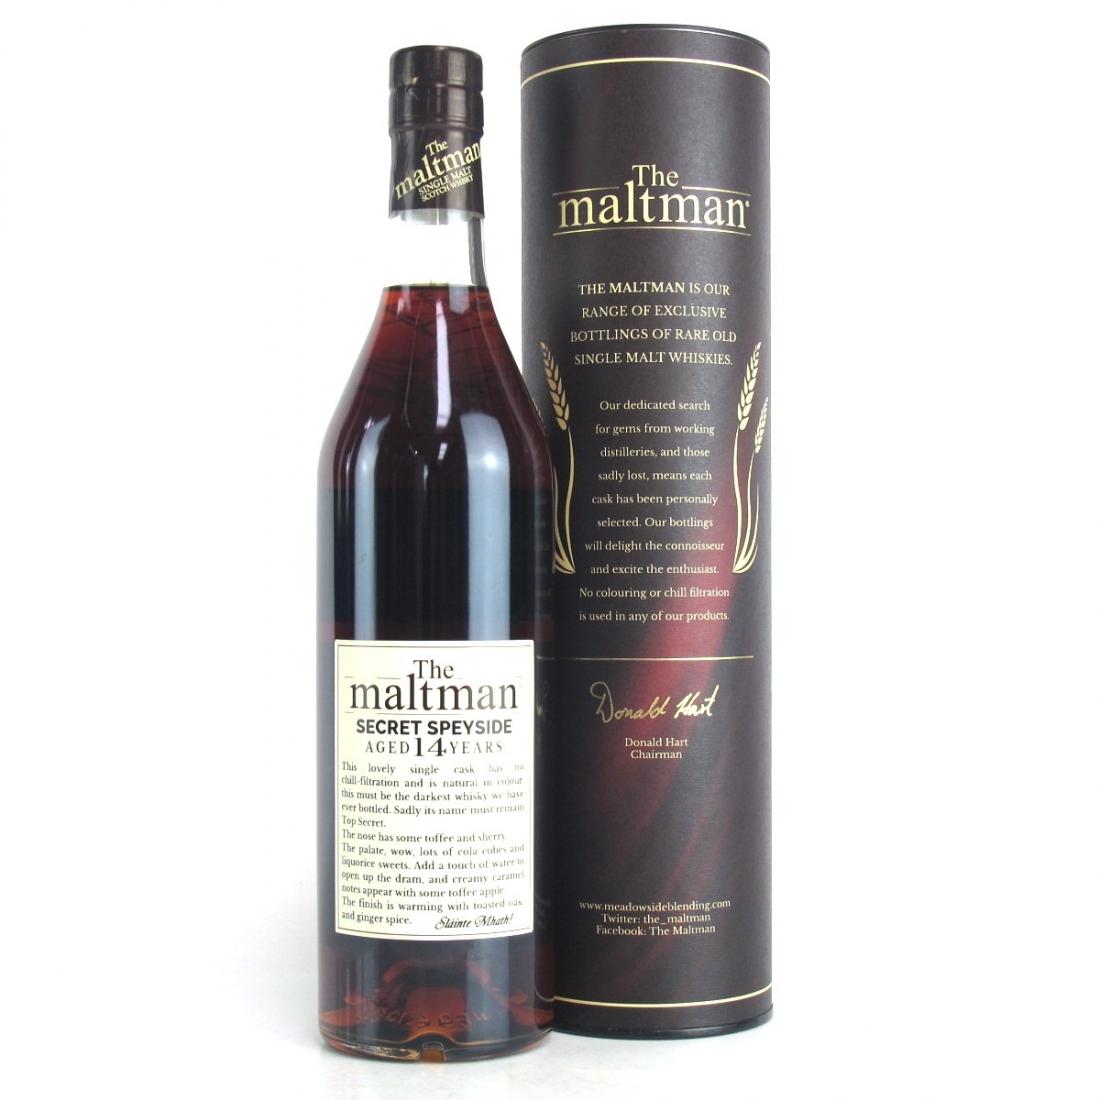 Secret Speyside 2002 Maltman 14 Year Old / Macallan